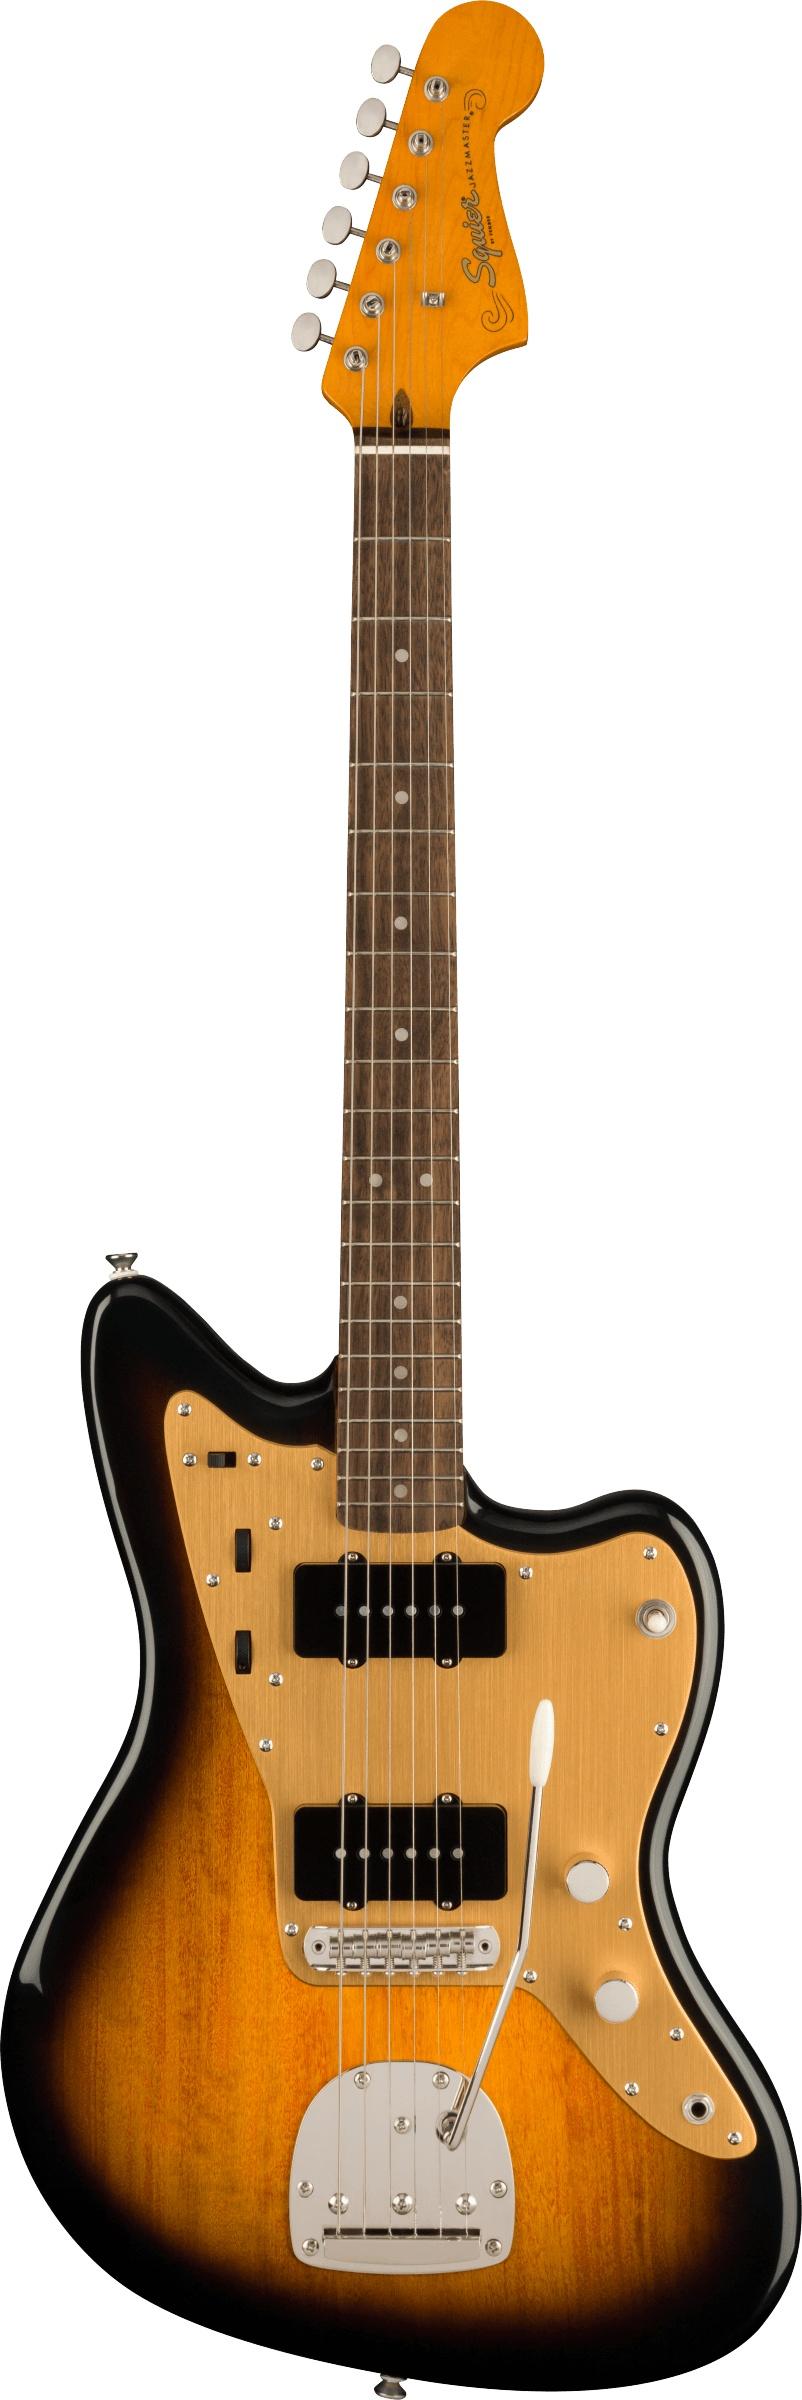 Squier FSR Classic Vibe Late '50s Jazzmaster®, Laurel Fingerboard, Gold Anodized Pickguard, 2-Color Sunburst